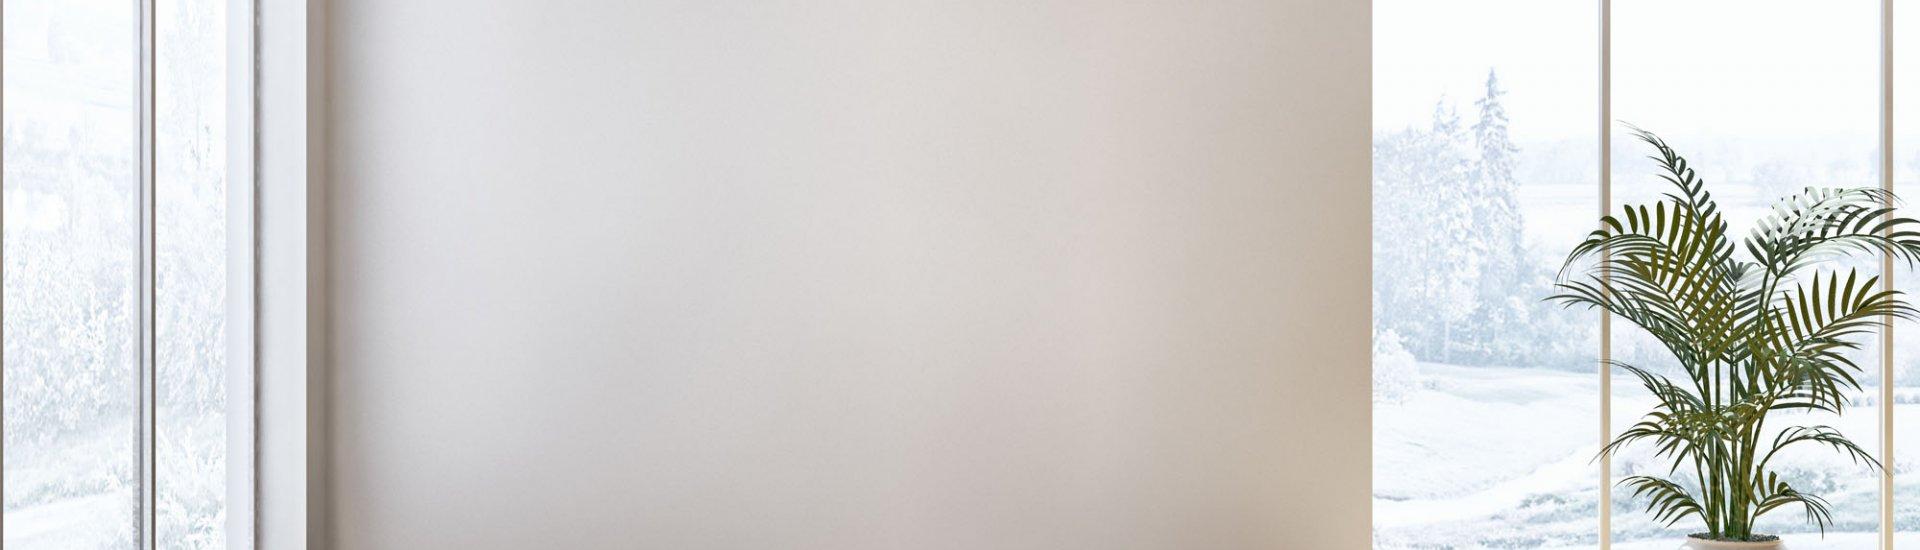 Xiaomi Saugroboter: Top 3 Modelle, richtige Anwendung